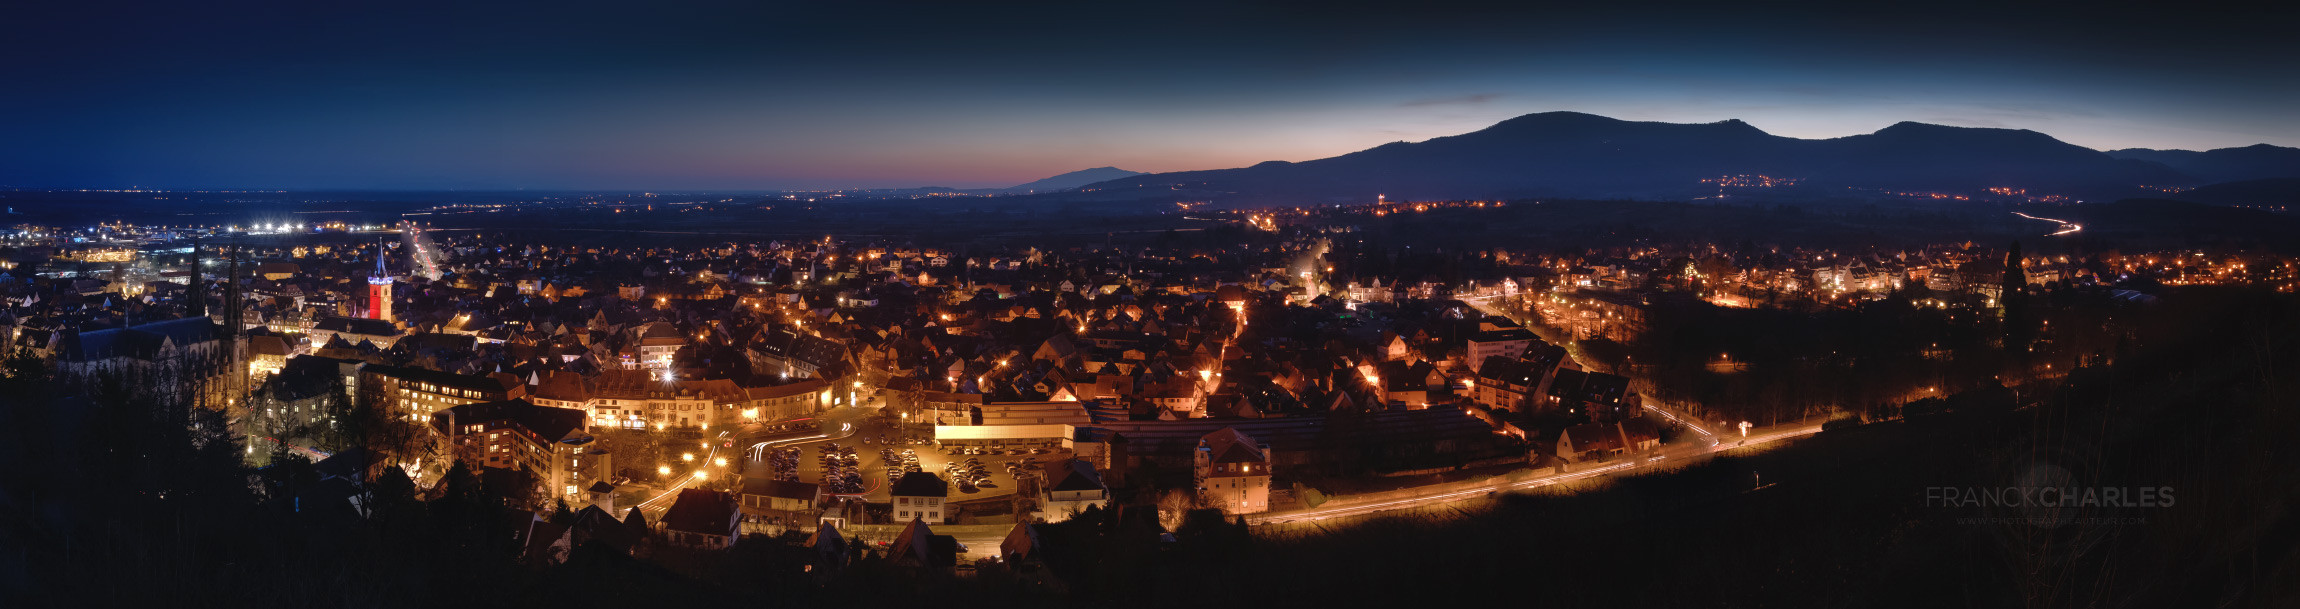 Obernai by night - Franck Charles